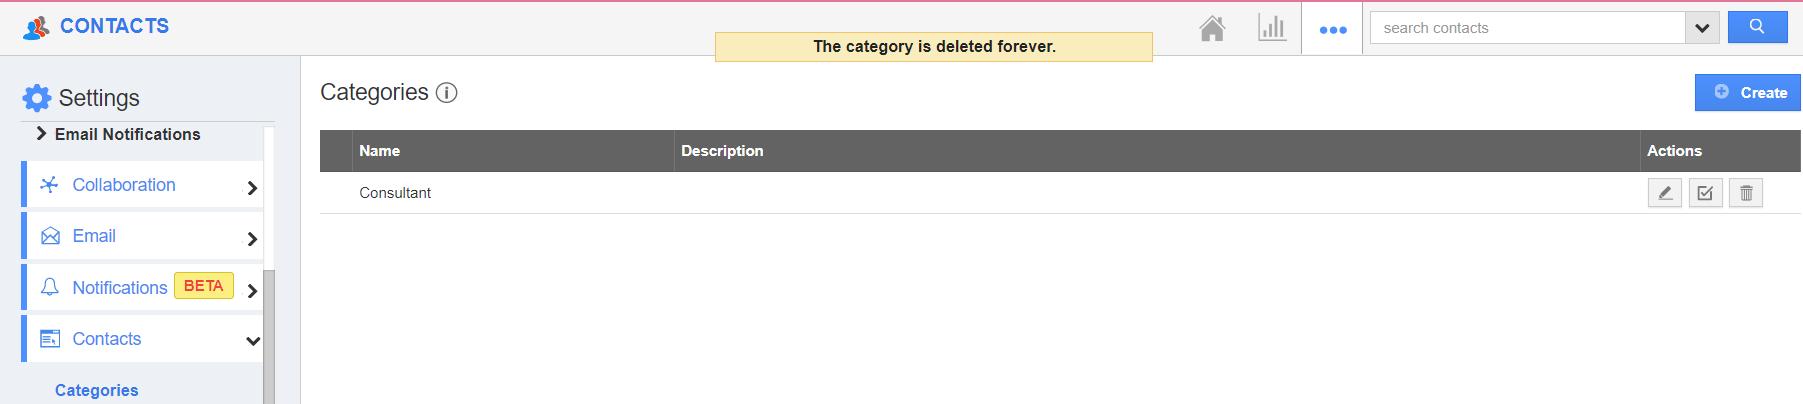 Deleted Forever